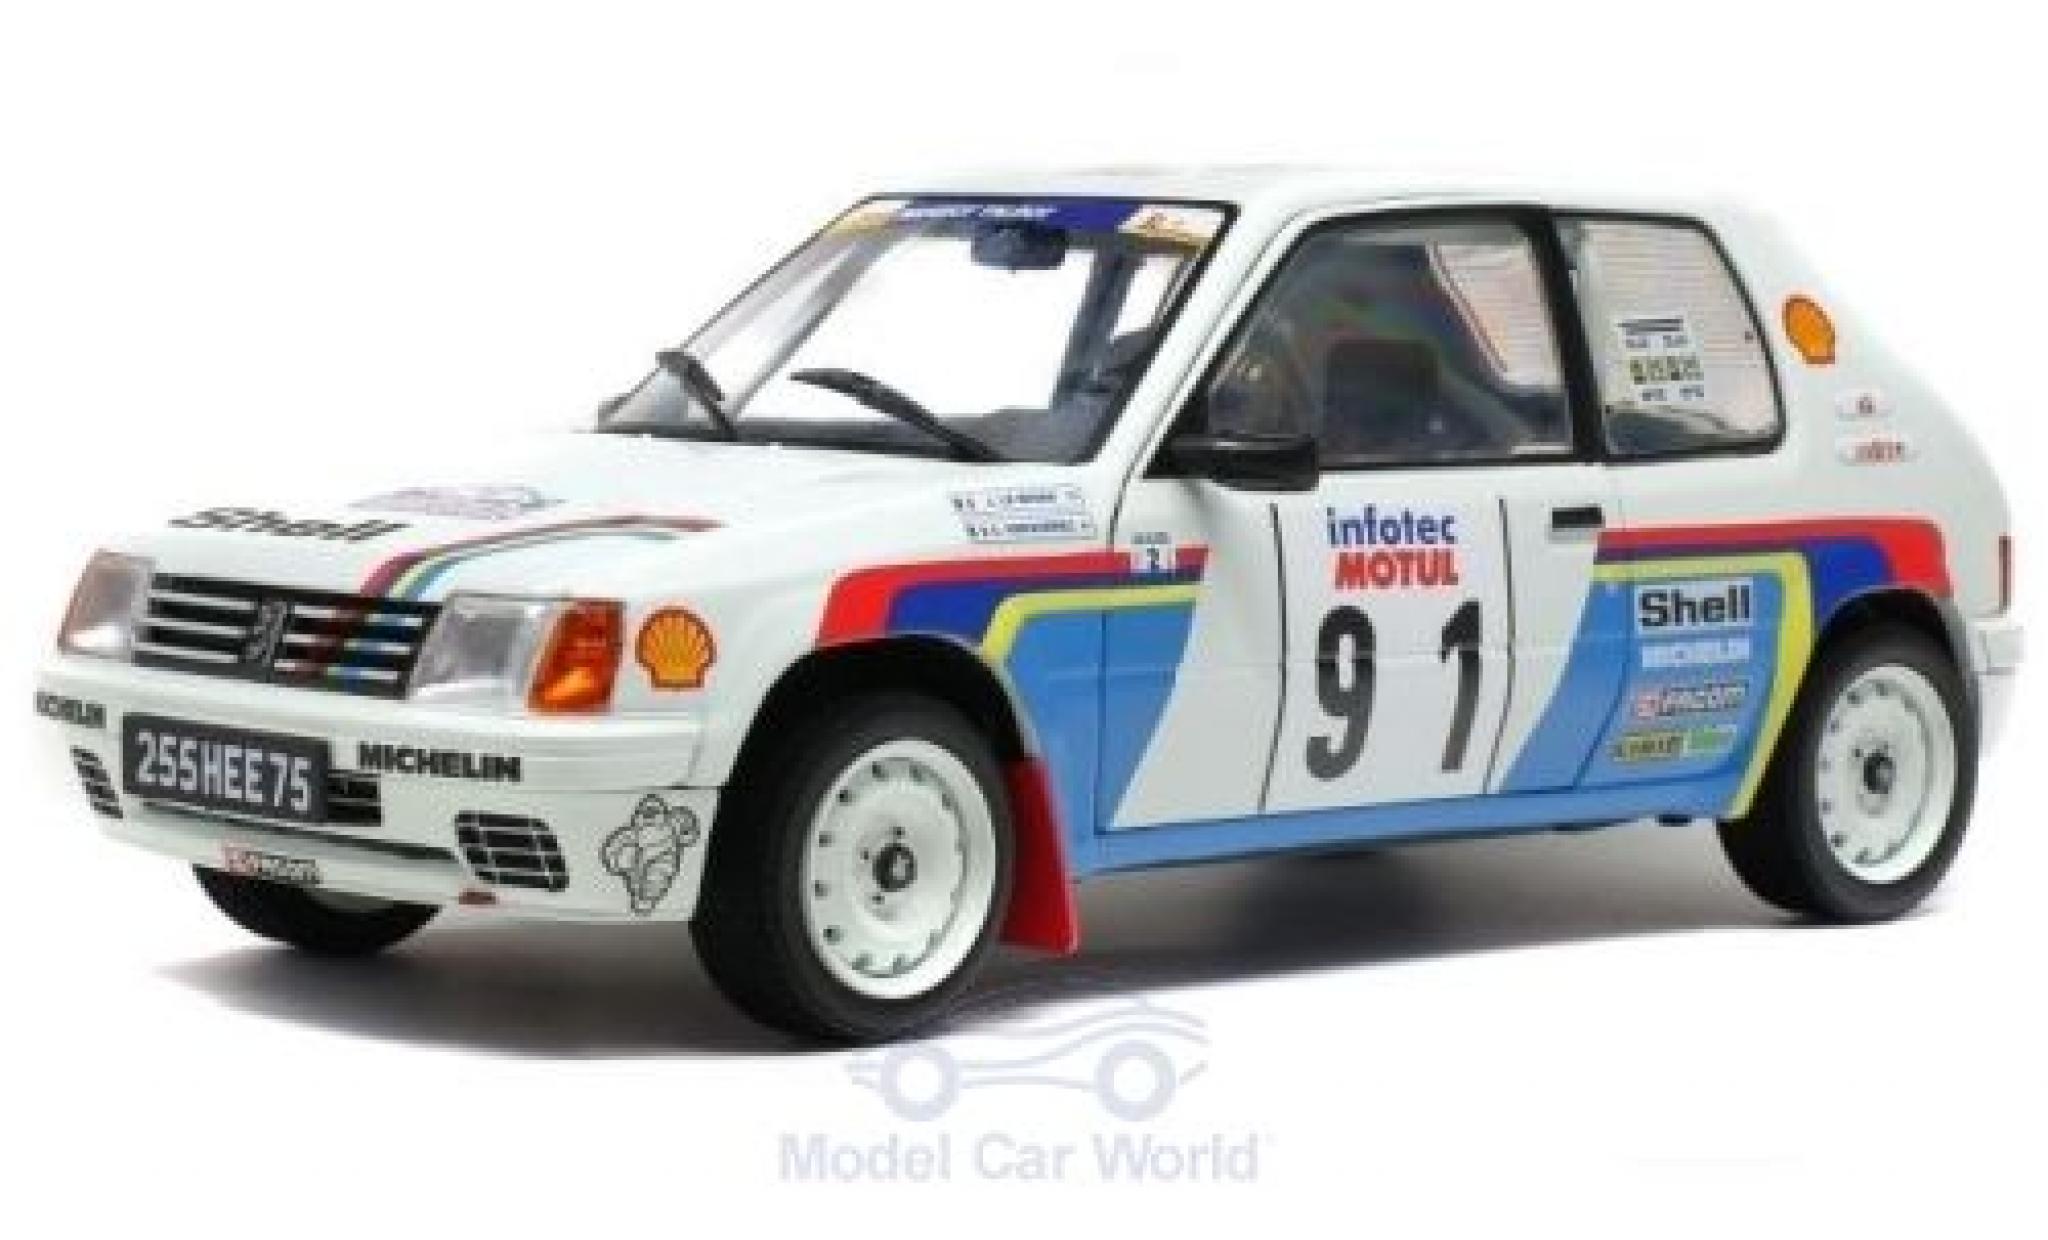 Peugeot 205 1/18 Solido Rallye No.91 Rallye WM Rallye Tour de Corse 1989 J.Le Bihan/S.Kervarrec